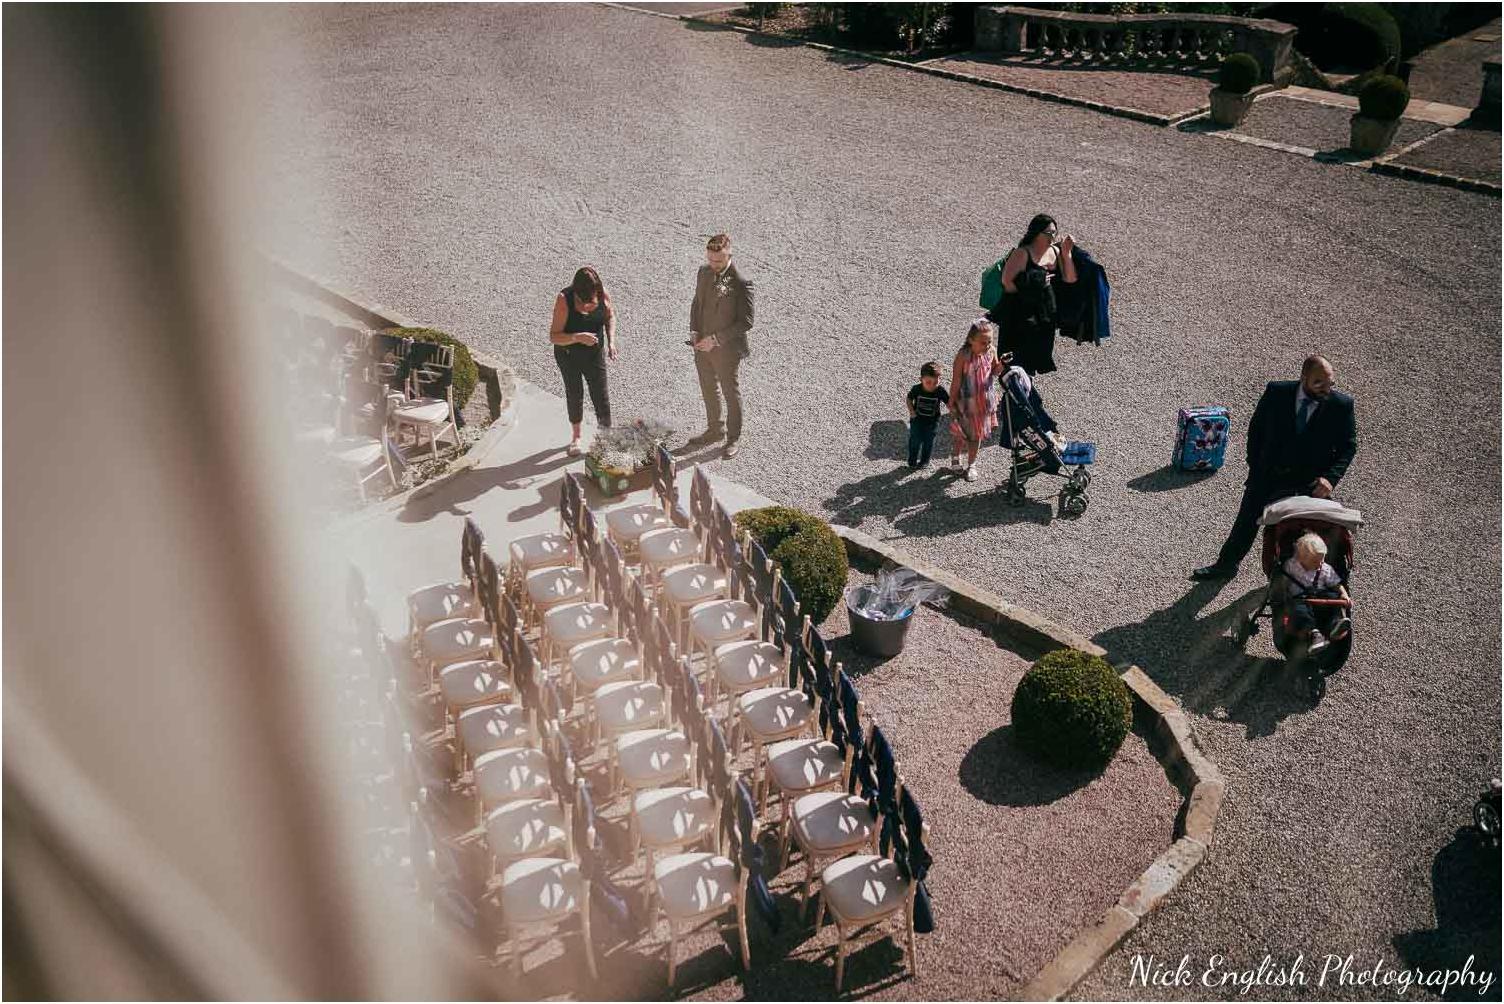 Eaves_Hall_Outdoor_Wedding_Photograph-15.jpg